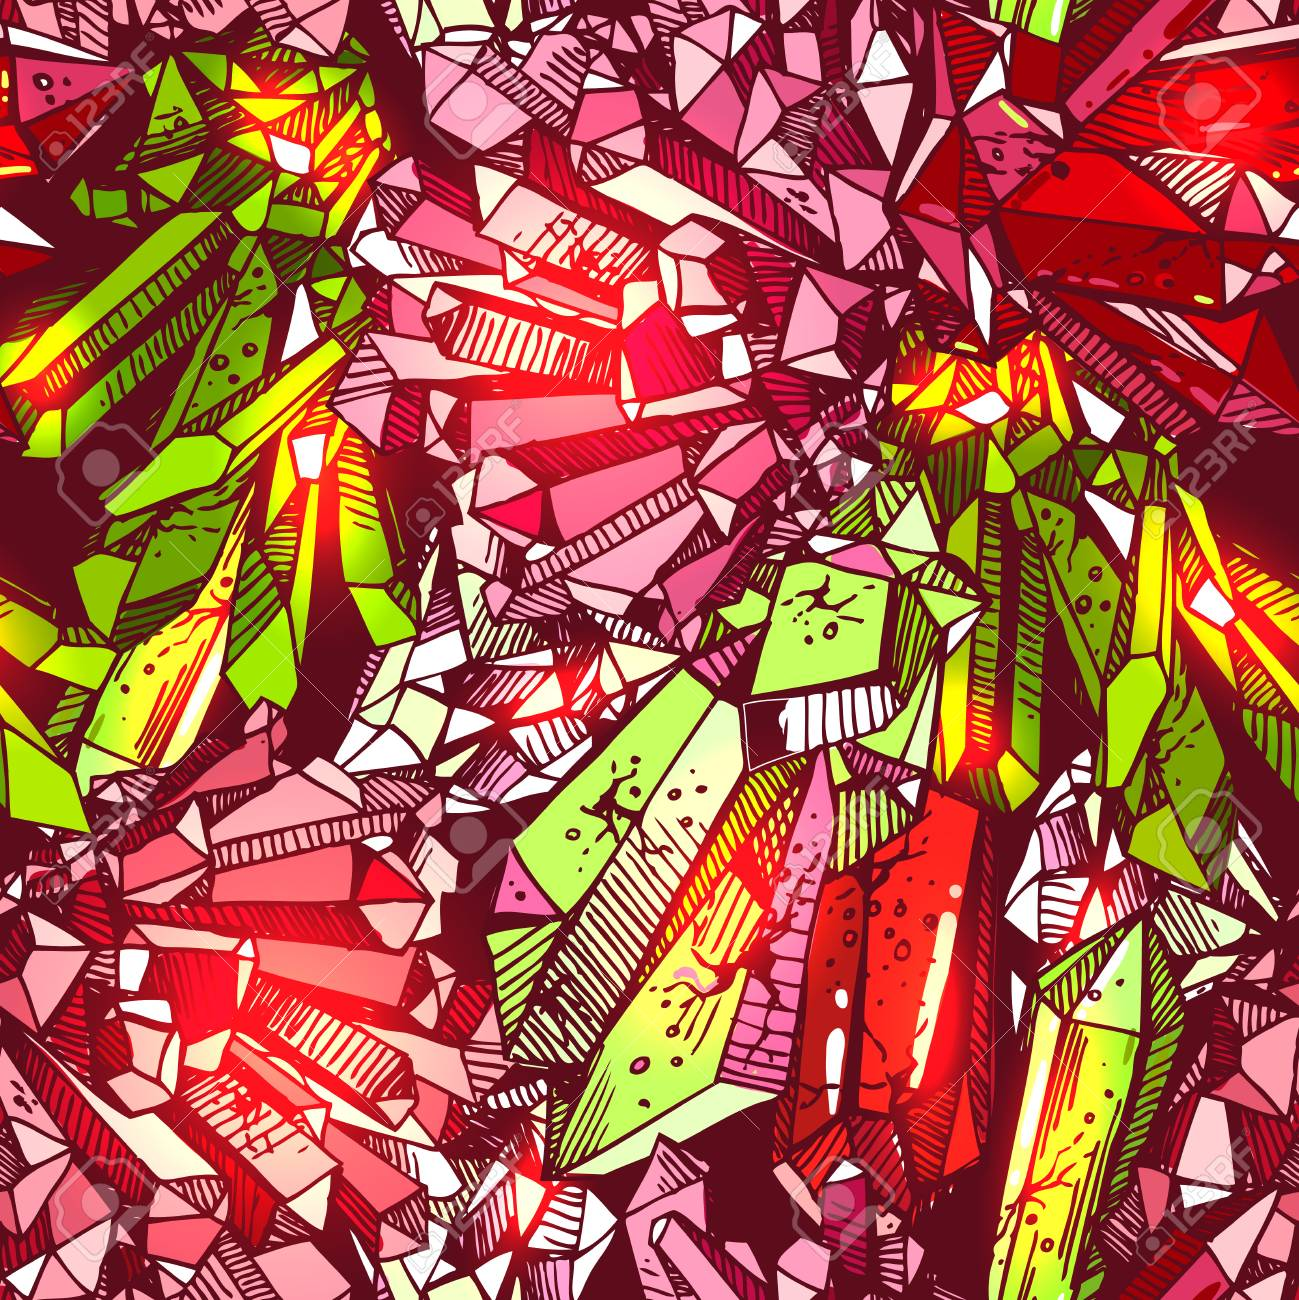 Beautiful Hand Drawn Vector Illustration Sketching Of Crystals ...